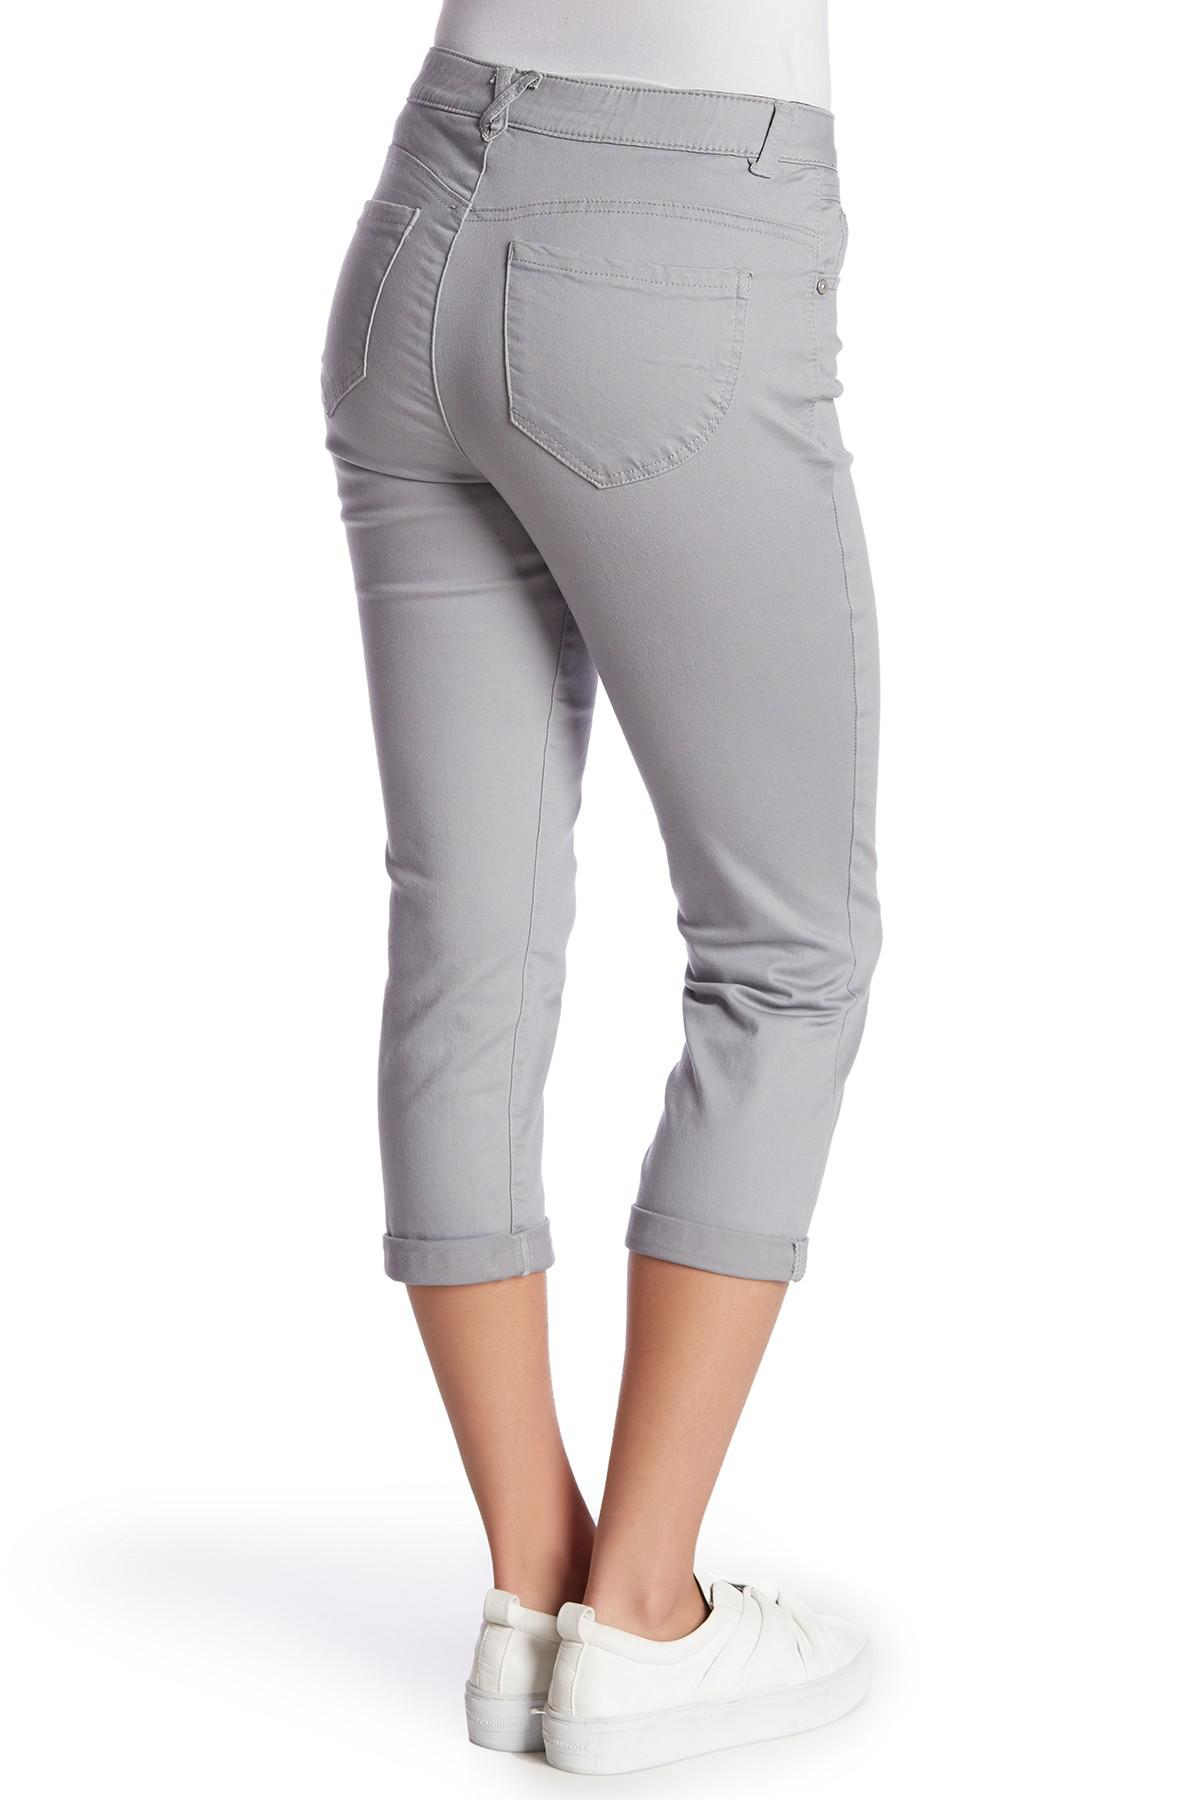 6ac28663d176e Democracy - Gray High-rise Stretch Twill Rolled Pants (petite) - Lyst. View  fullscreen